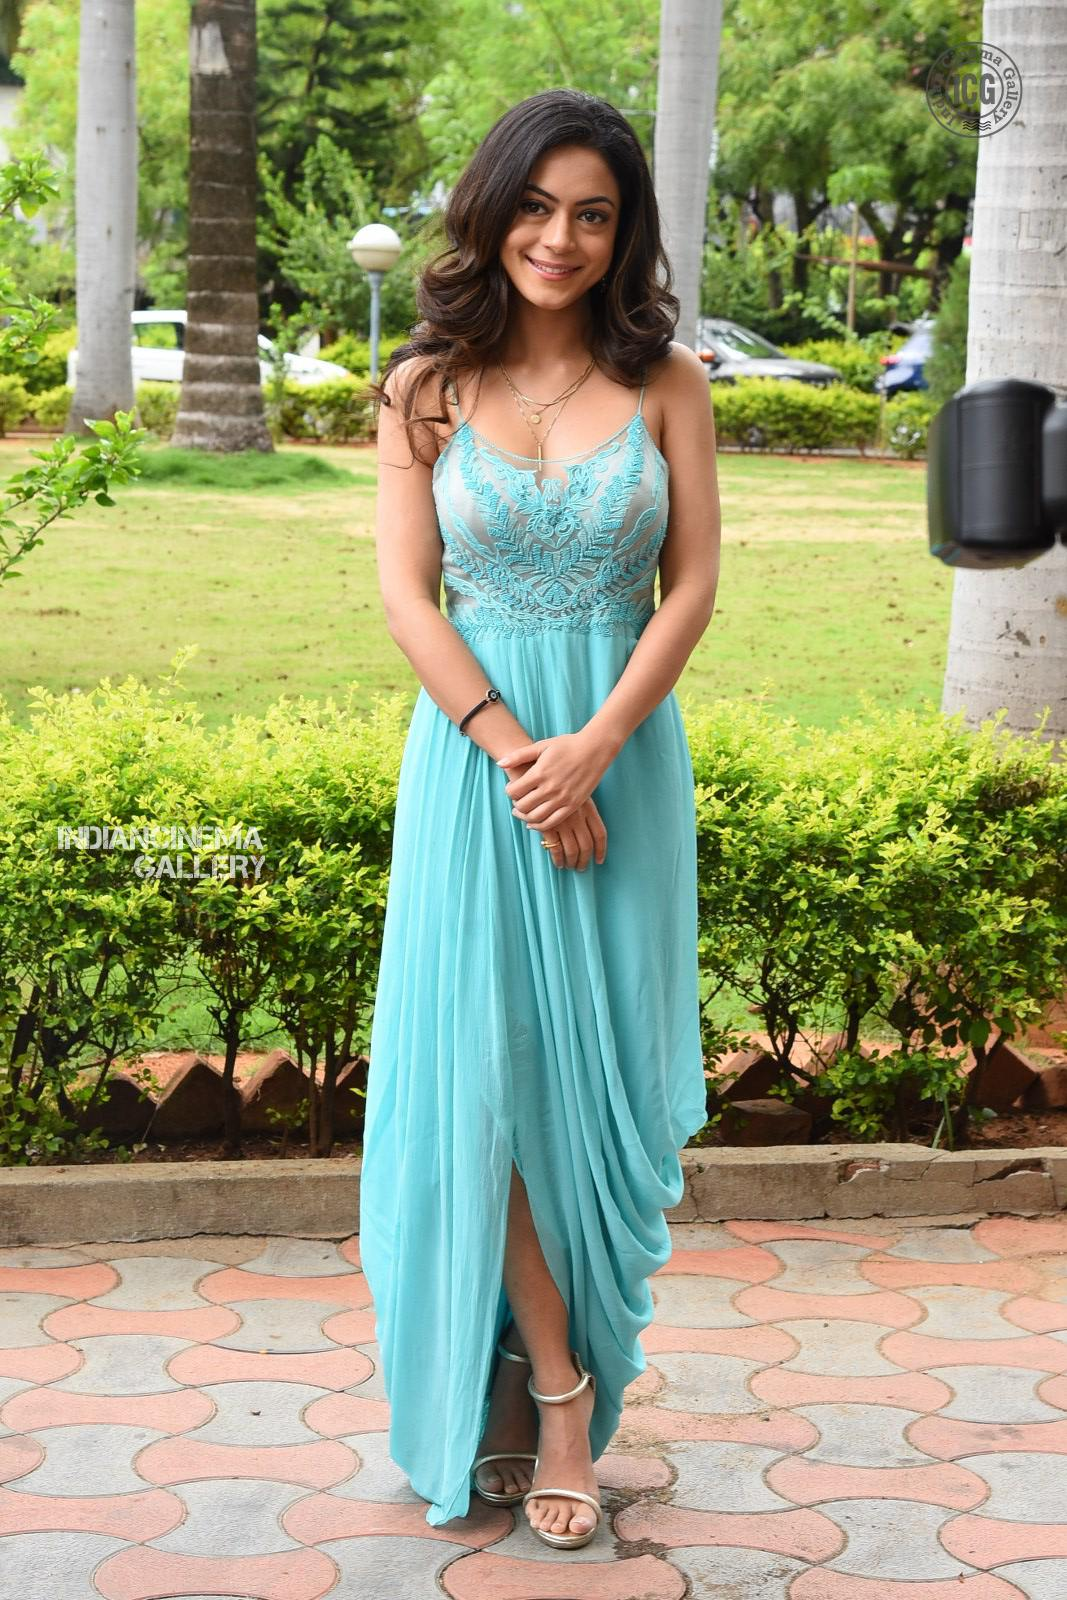 Anya Singh Stills (4)